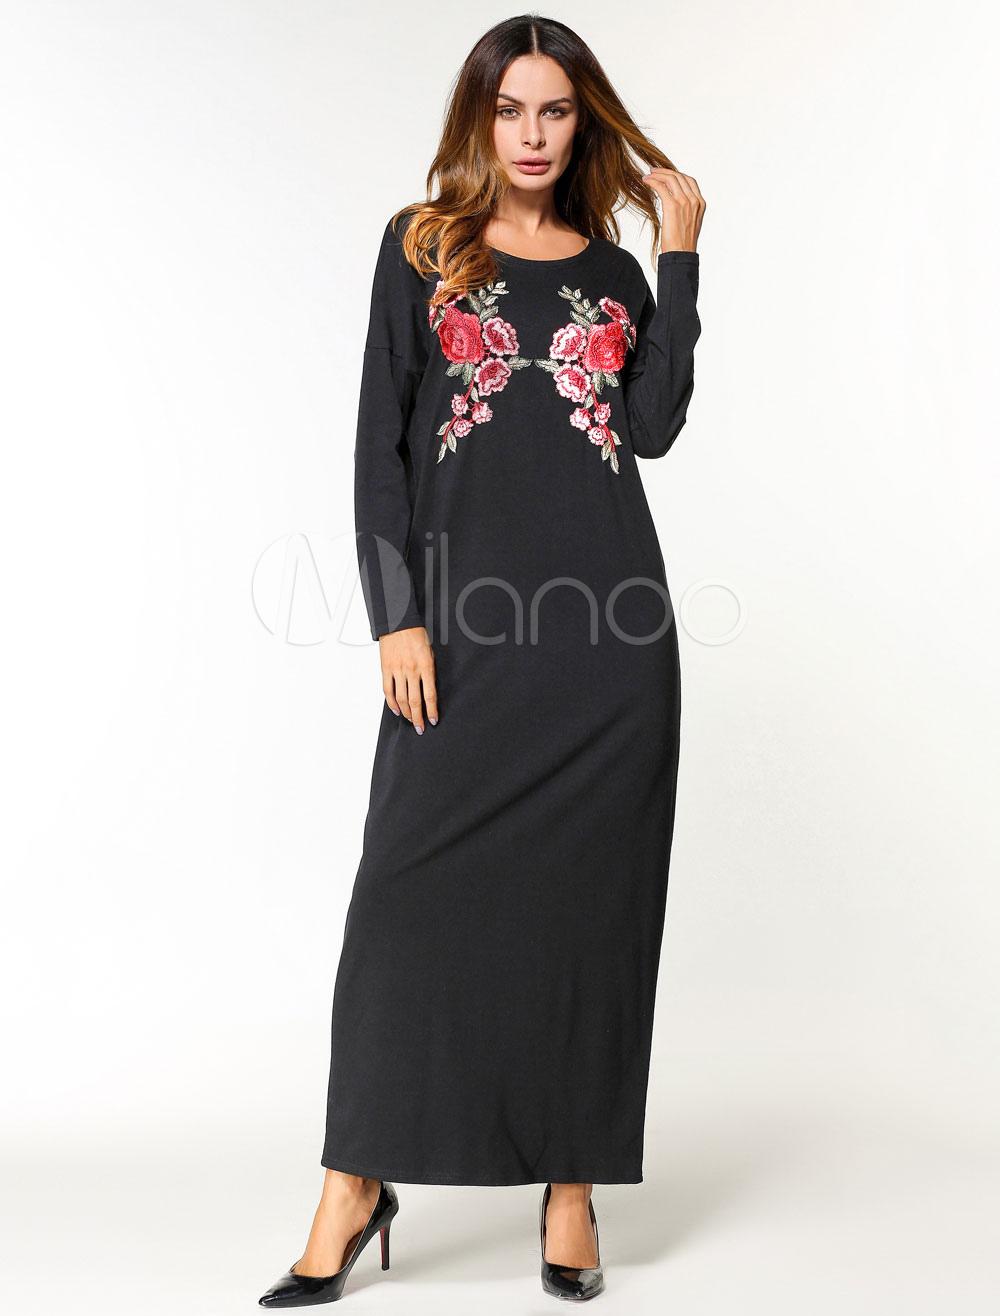 Black Abaya Dress Muslim Women Oversized Long Sleeve Floral Maxi Dress (Women\\'s Clothing Arabian Clothing) photo